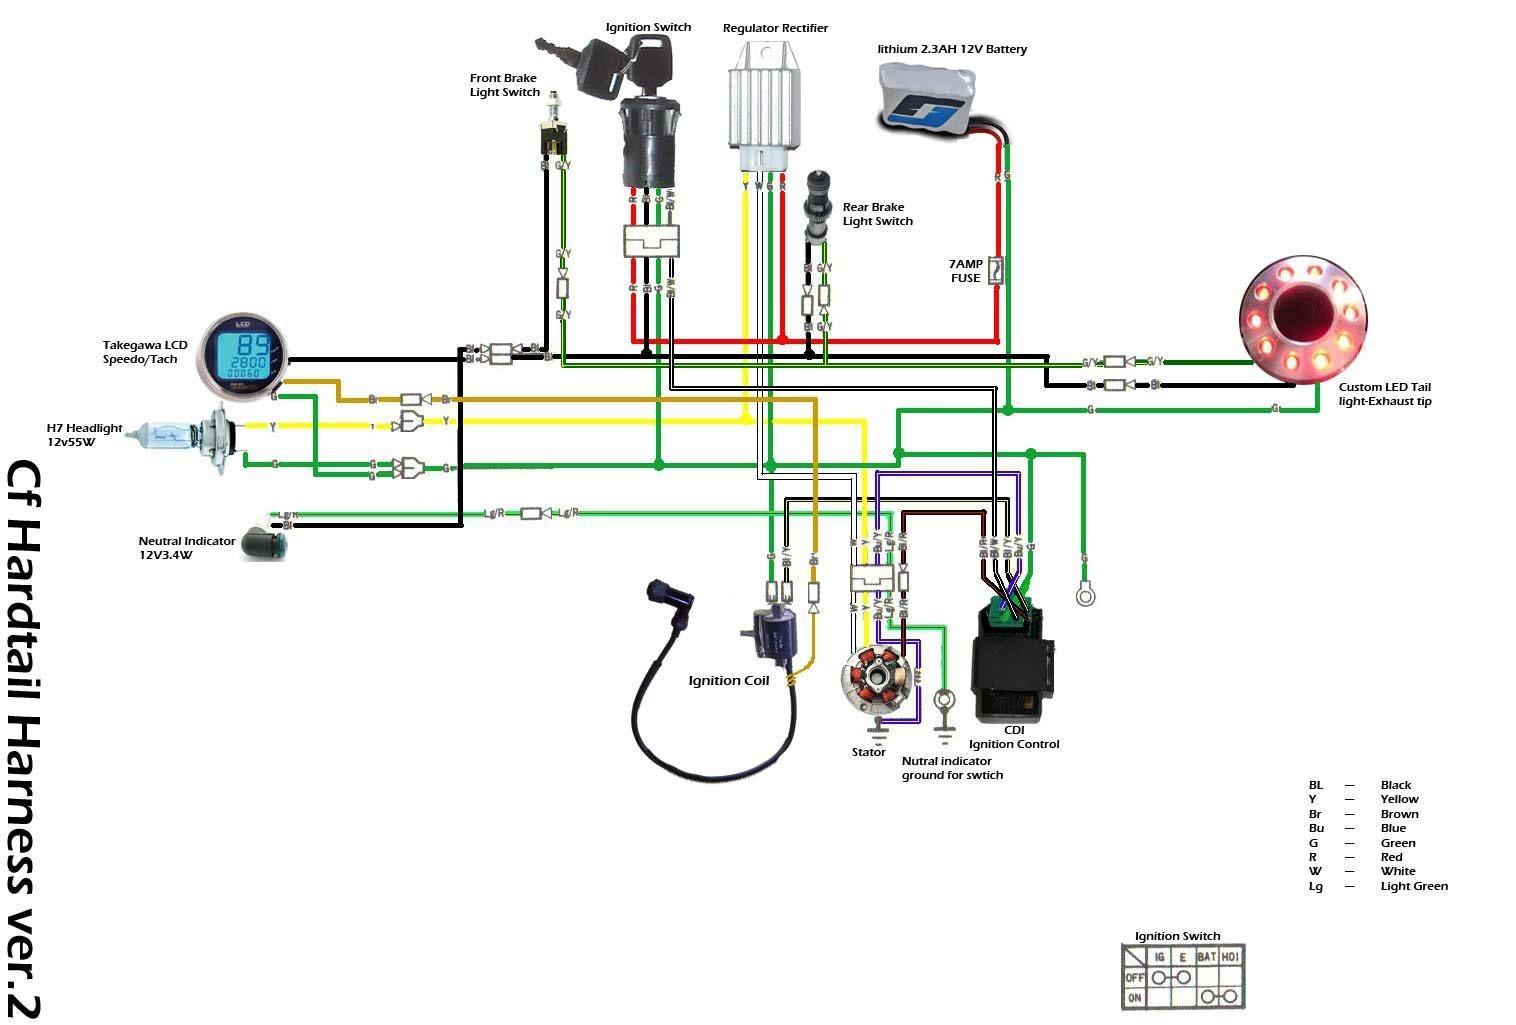 72cc Chinese atv/quad Wiring Schematic/diagram 110cc Basic Wiring Setup atvconnection atv Enthusiast Munity within 110cc Chinese atv Of 72cc Chinese atv/quad Wiring Schematic/diagram